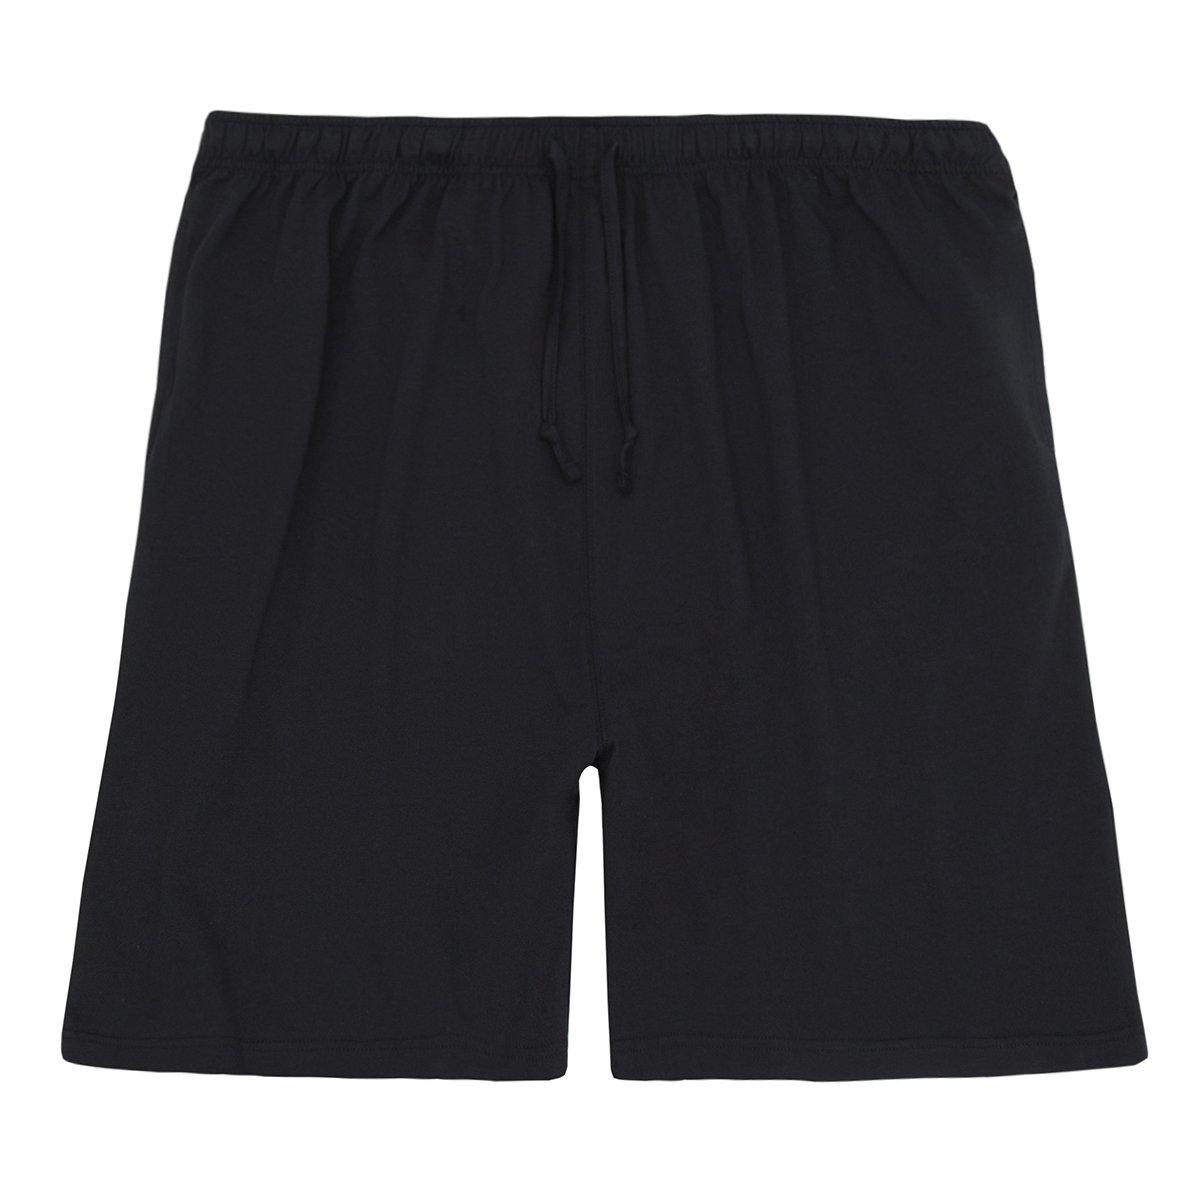 Mens Plus Size Cotton Jersey Shorts Baum Trading